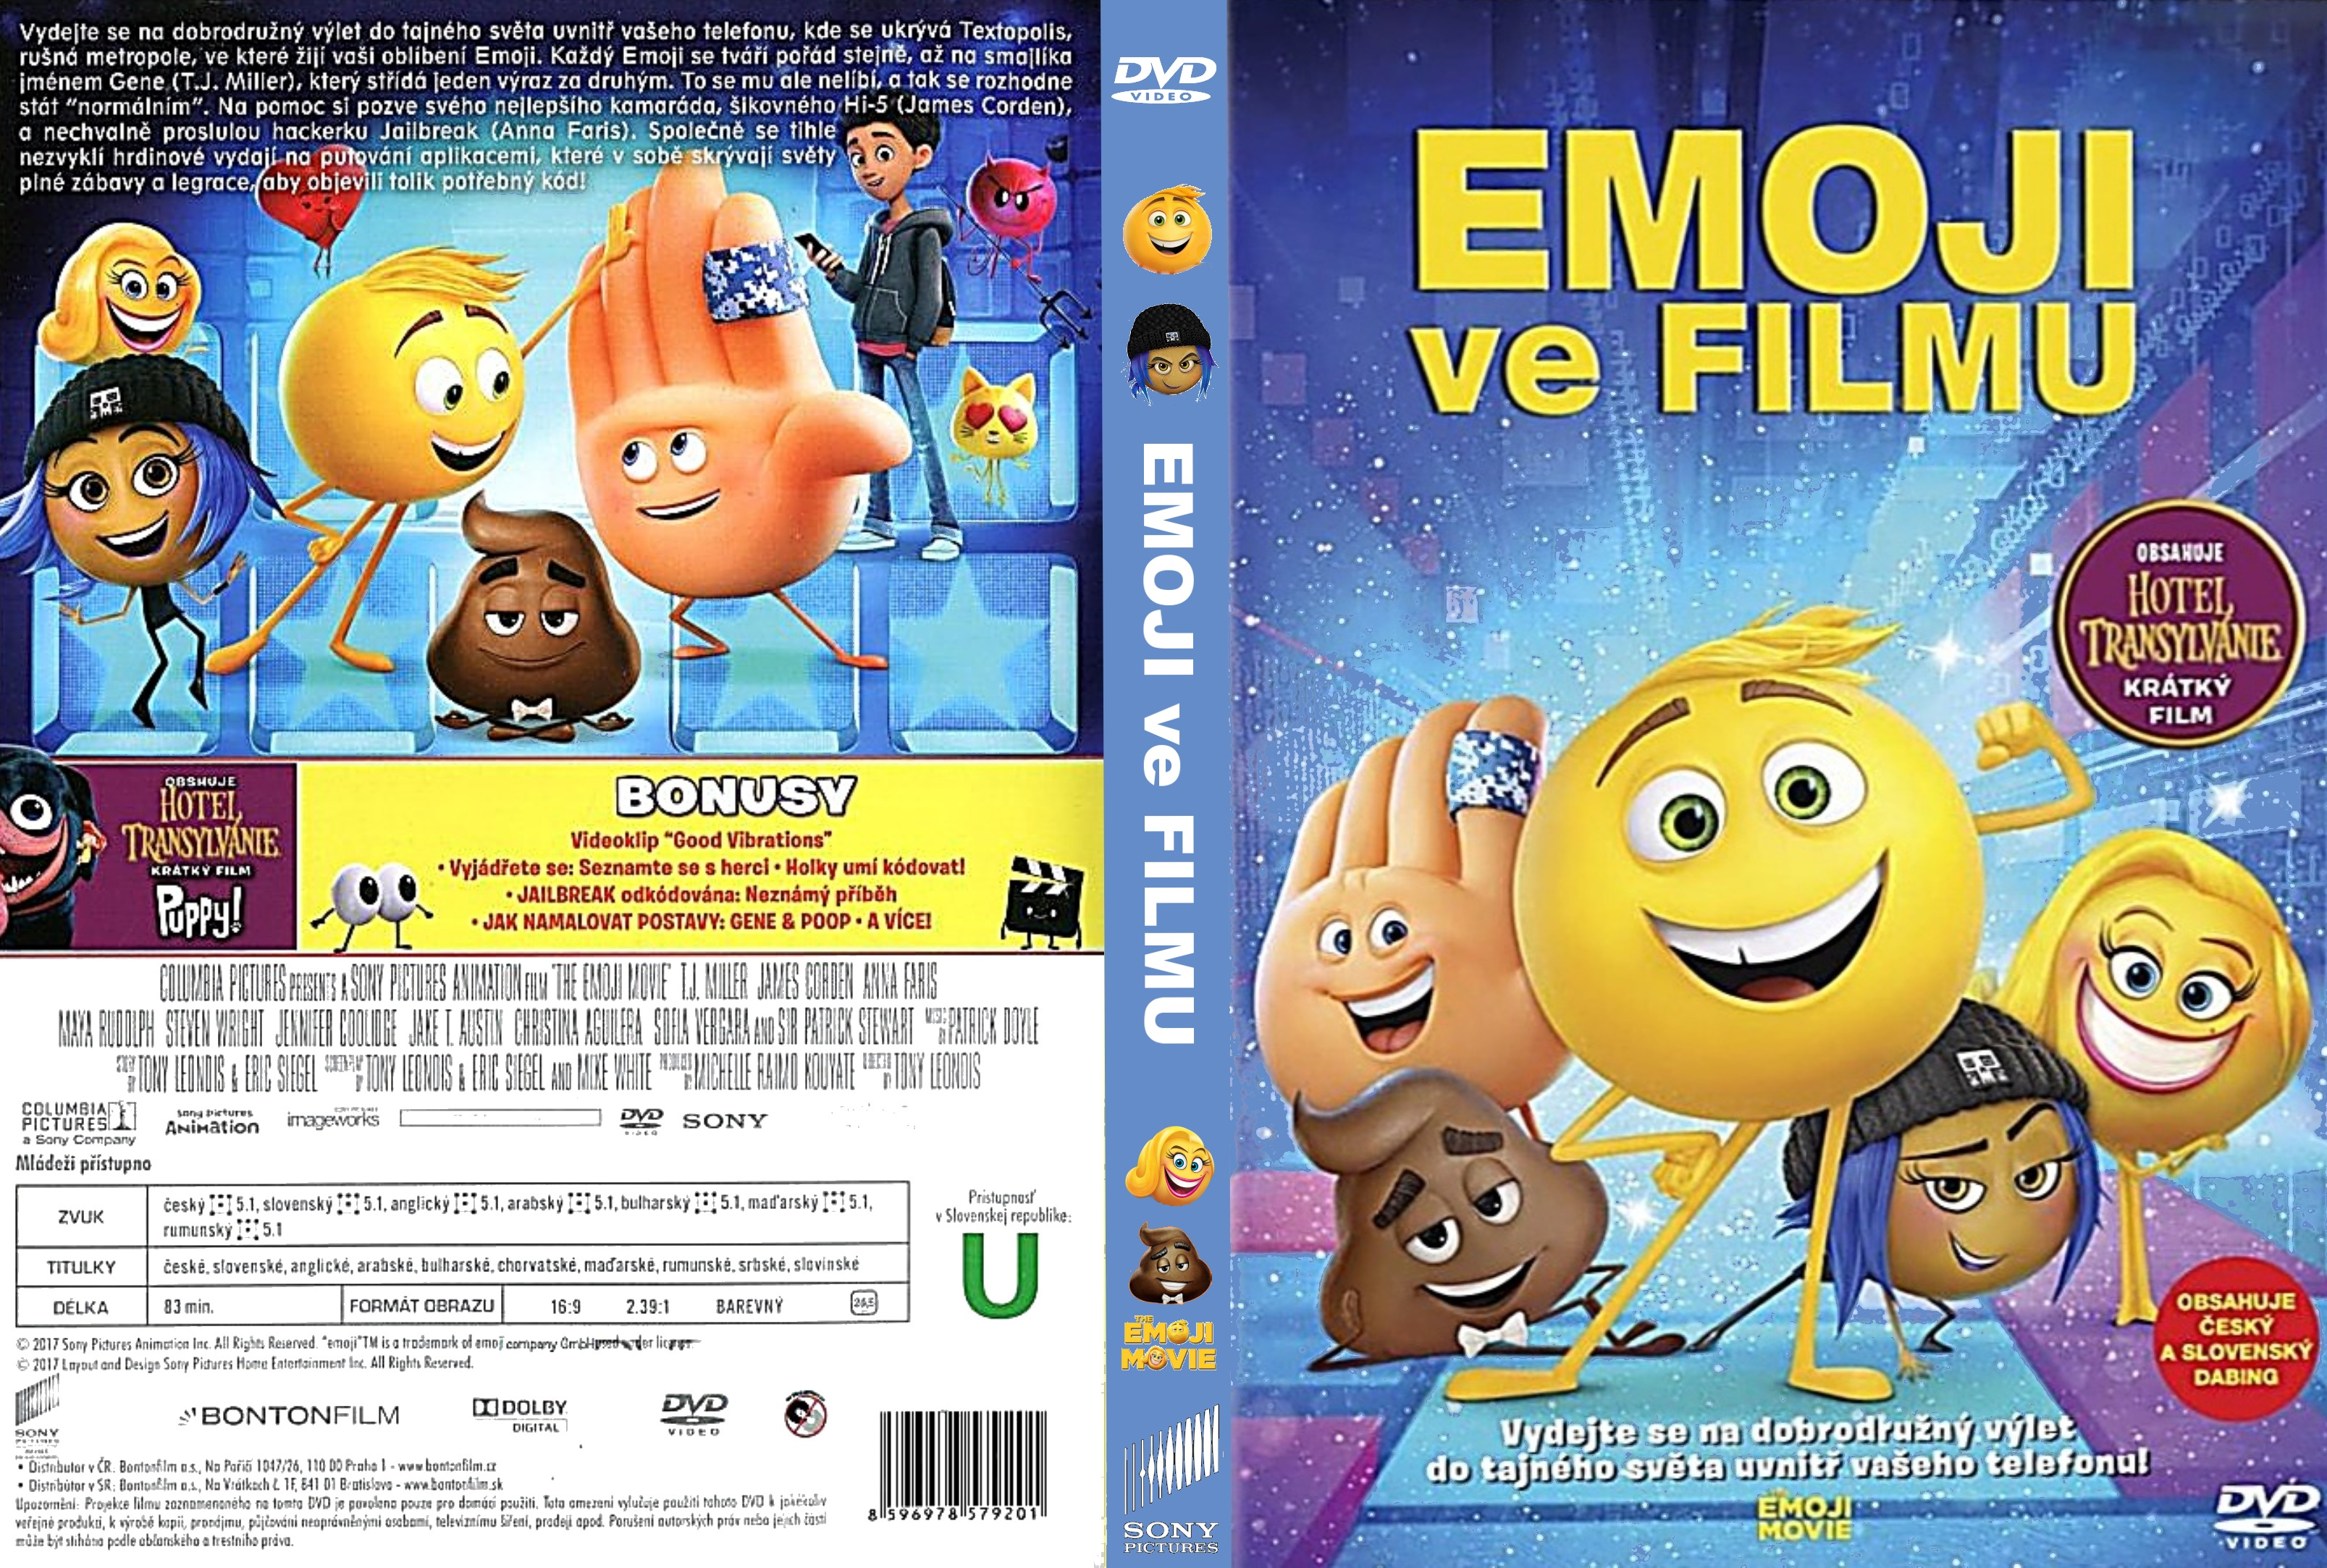 COVERS BOX SK ::: The Emoji Movie (2017) - high quality DVD